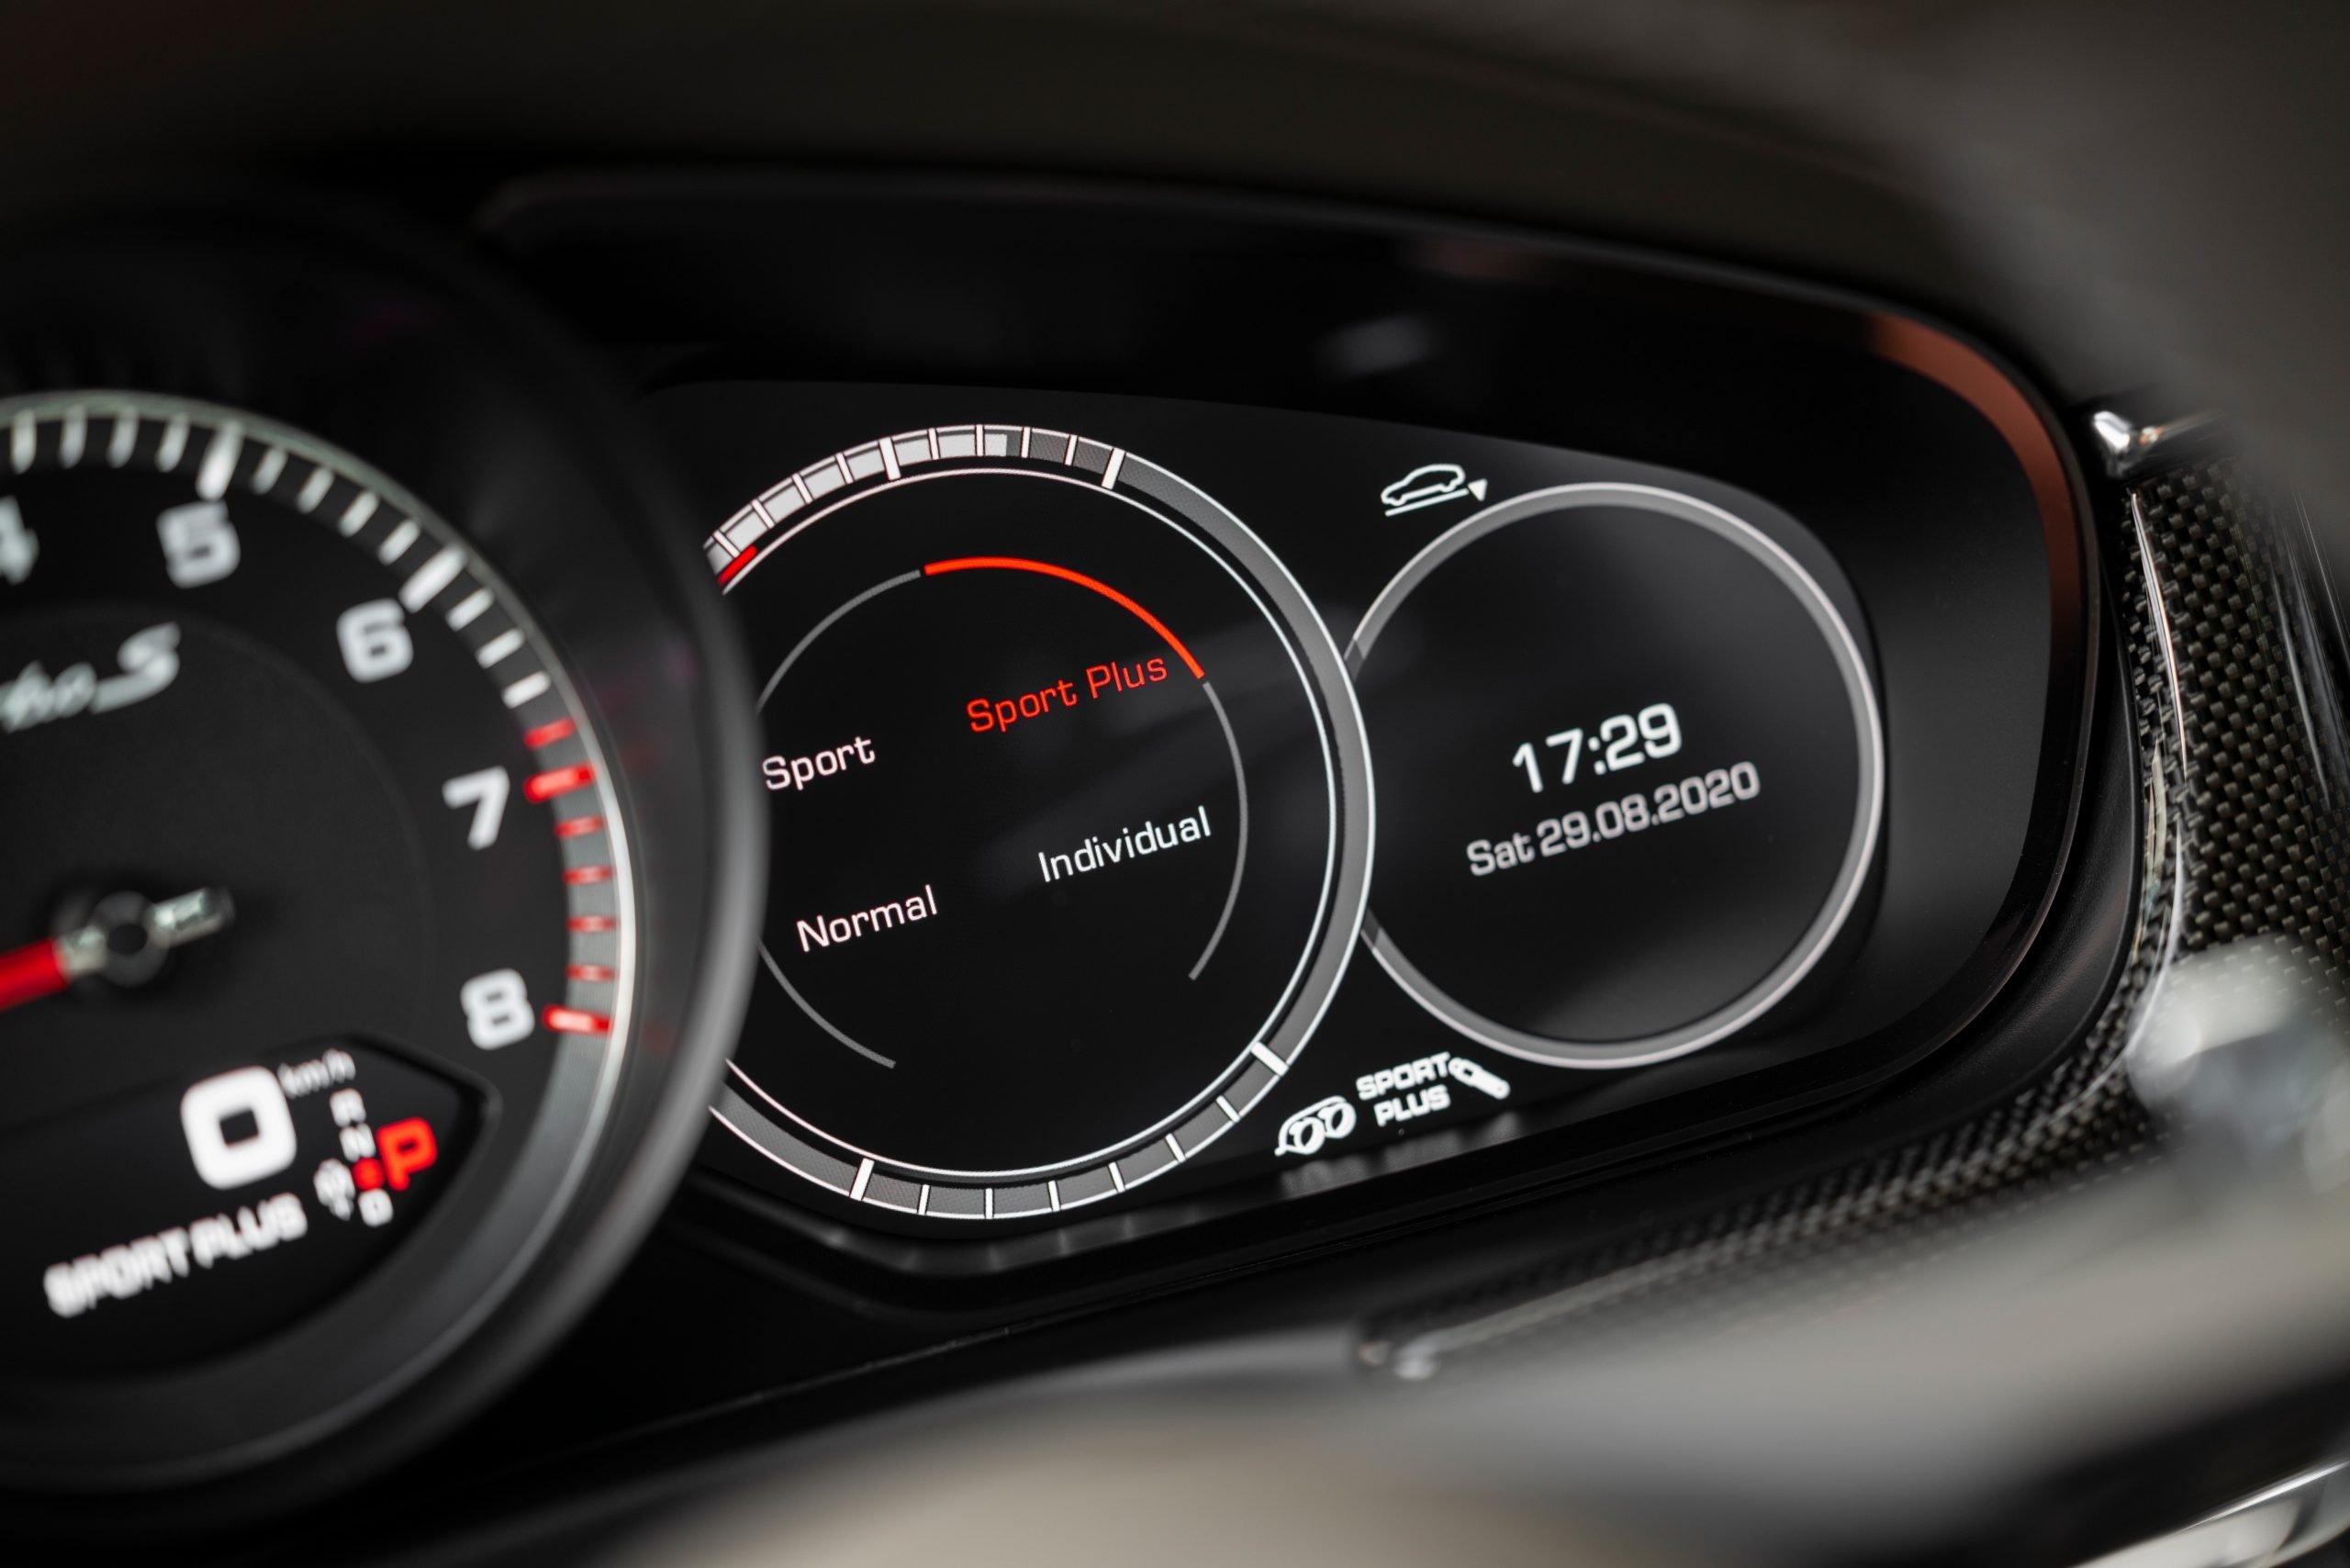 2021 Porsche Panamera Turbo S Instrument Cluster